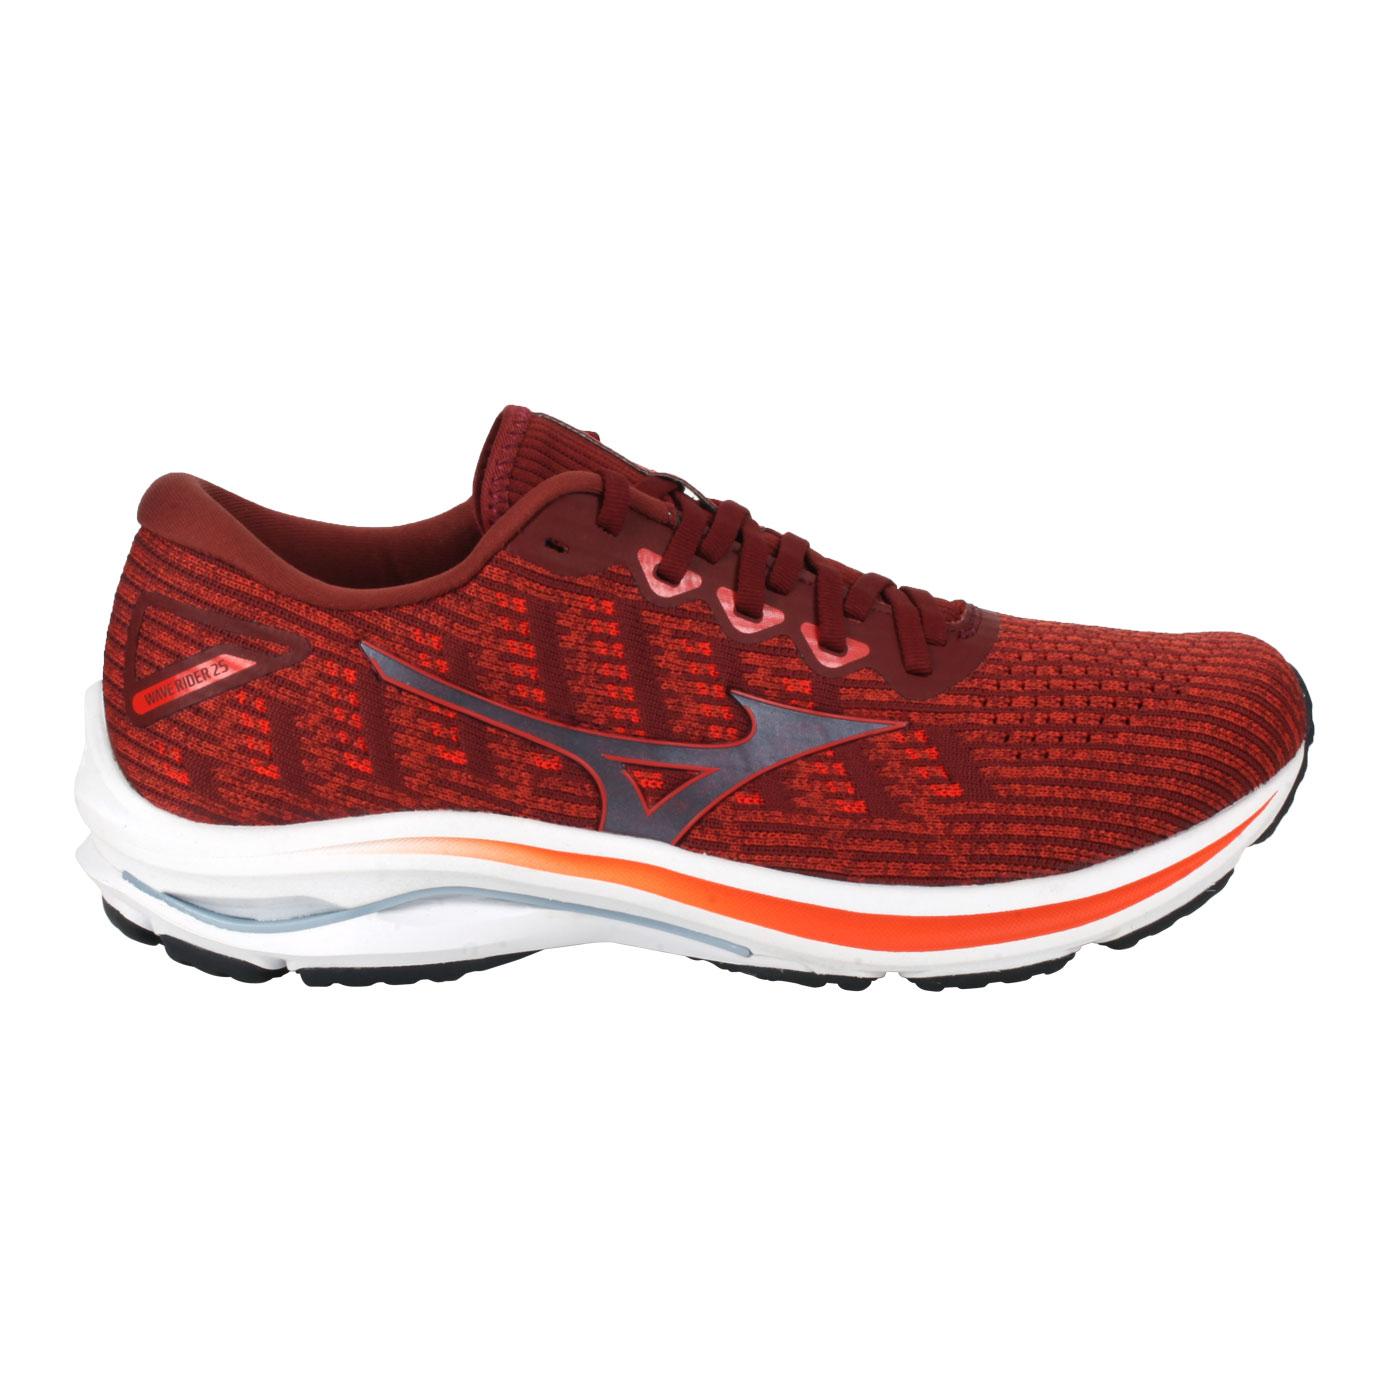 MIZUNO 特定-男款慢跑鞋-4E  @WAVE RIDER 25 WAVEKNIT SW@J1GC217677